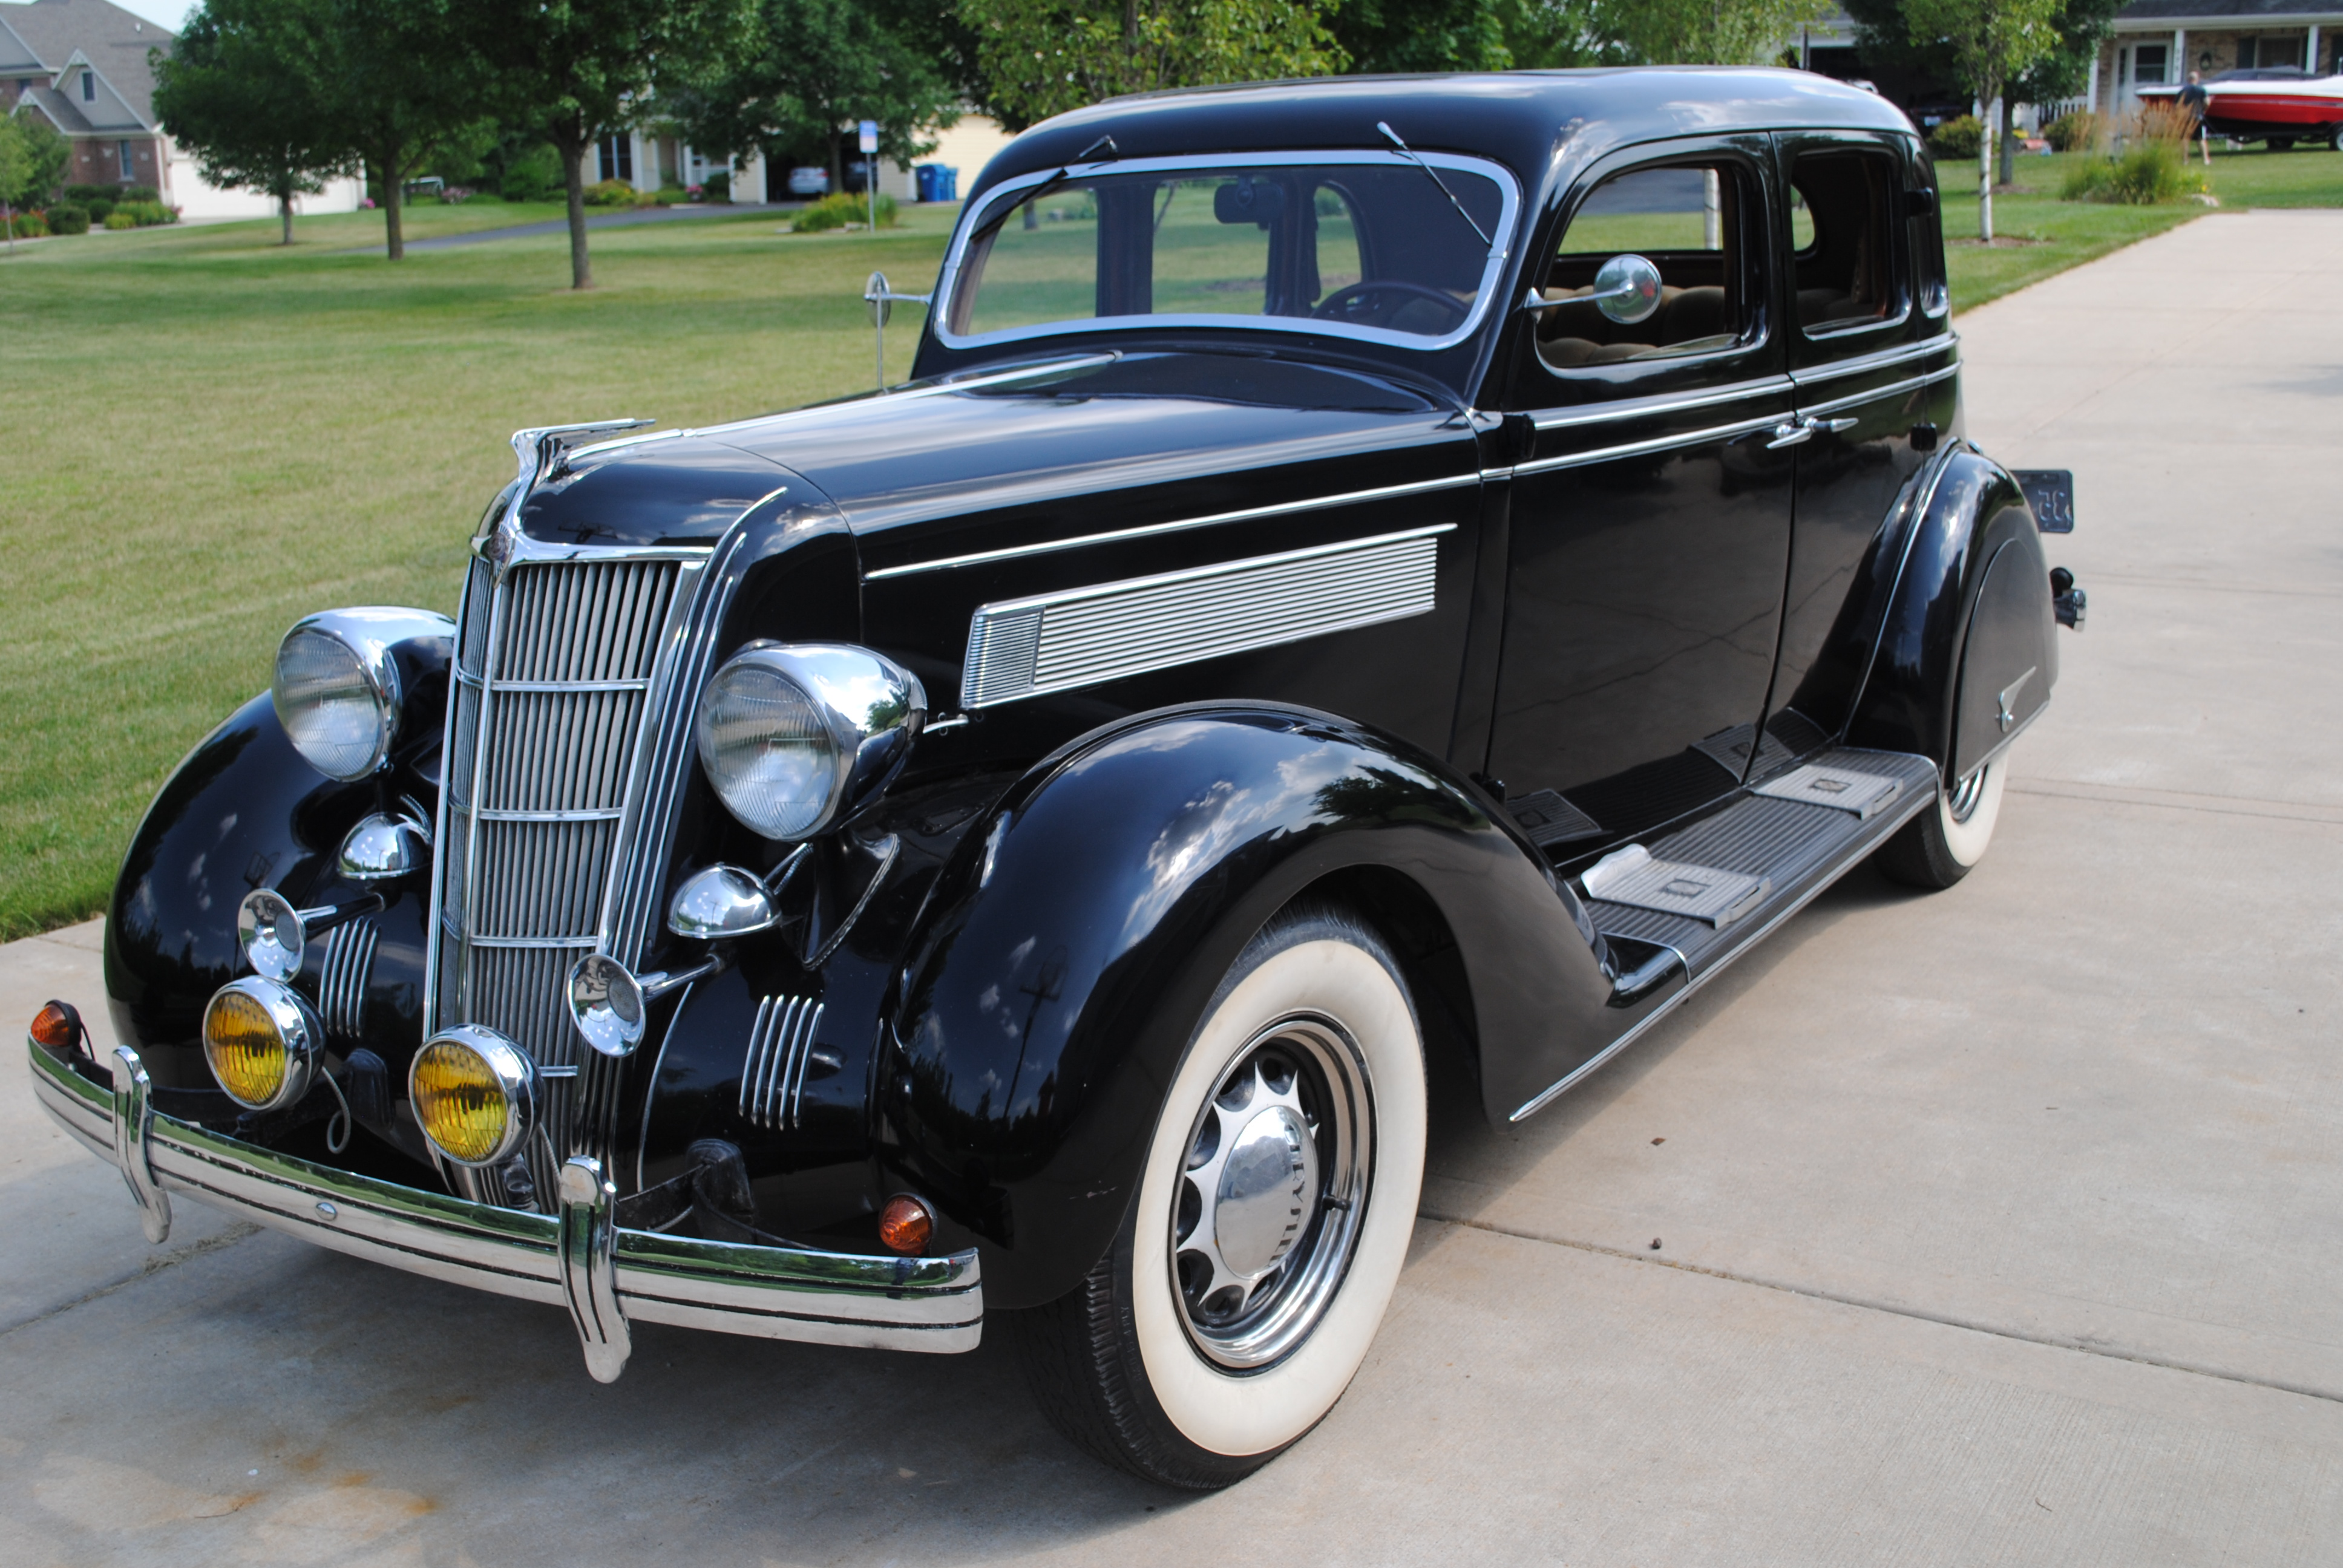 1935 chrysler airstream touring sedan sold oldmotorsguy com. Black Bedroom Furniture Sets. Home Design Ideas